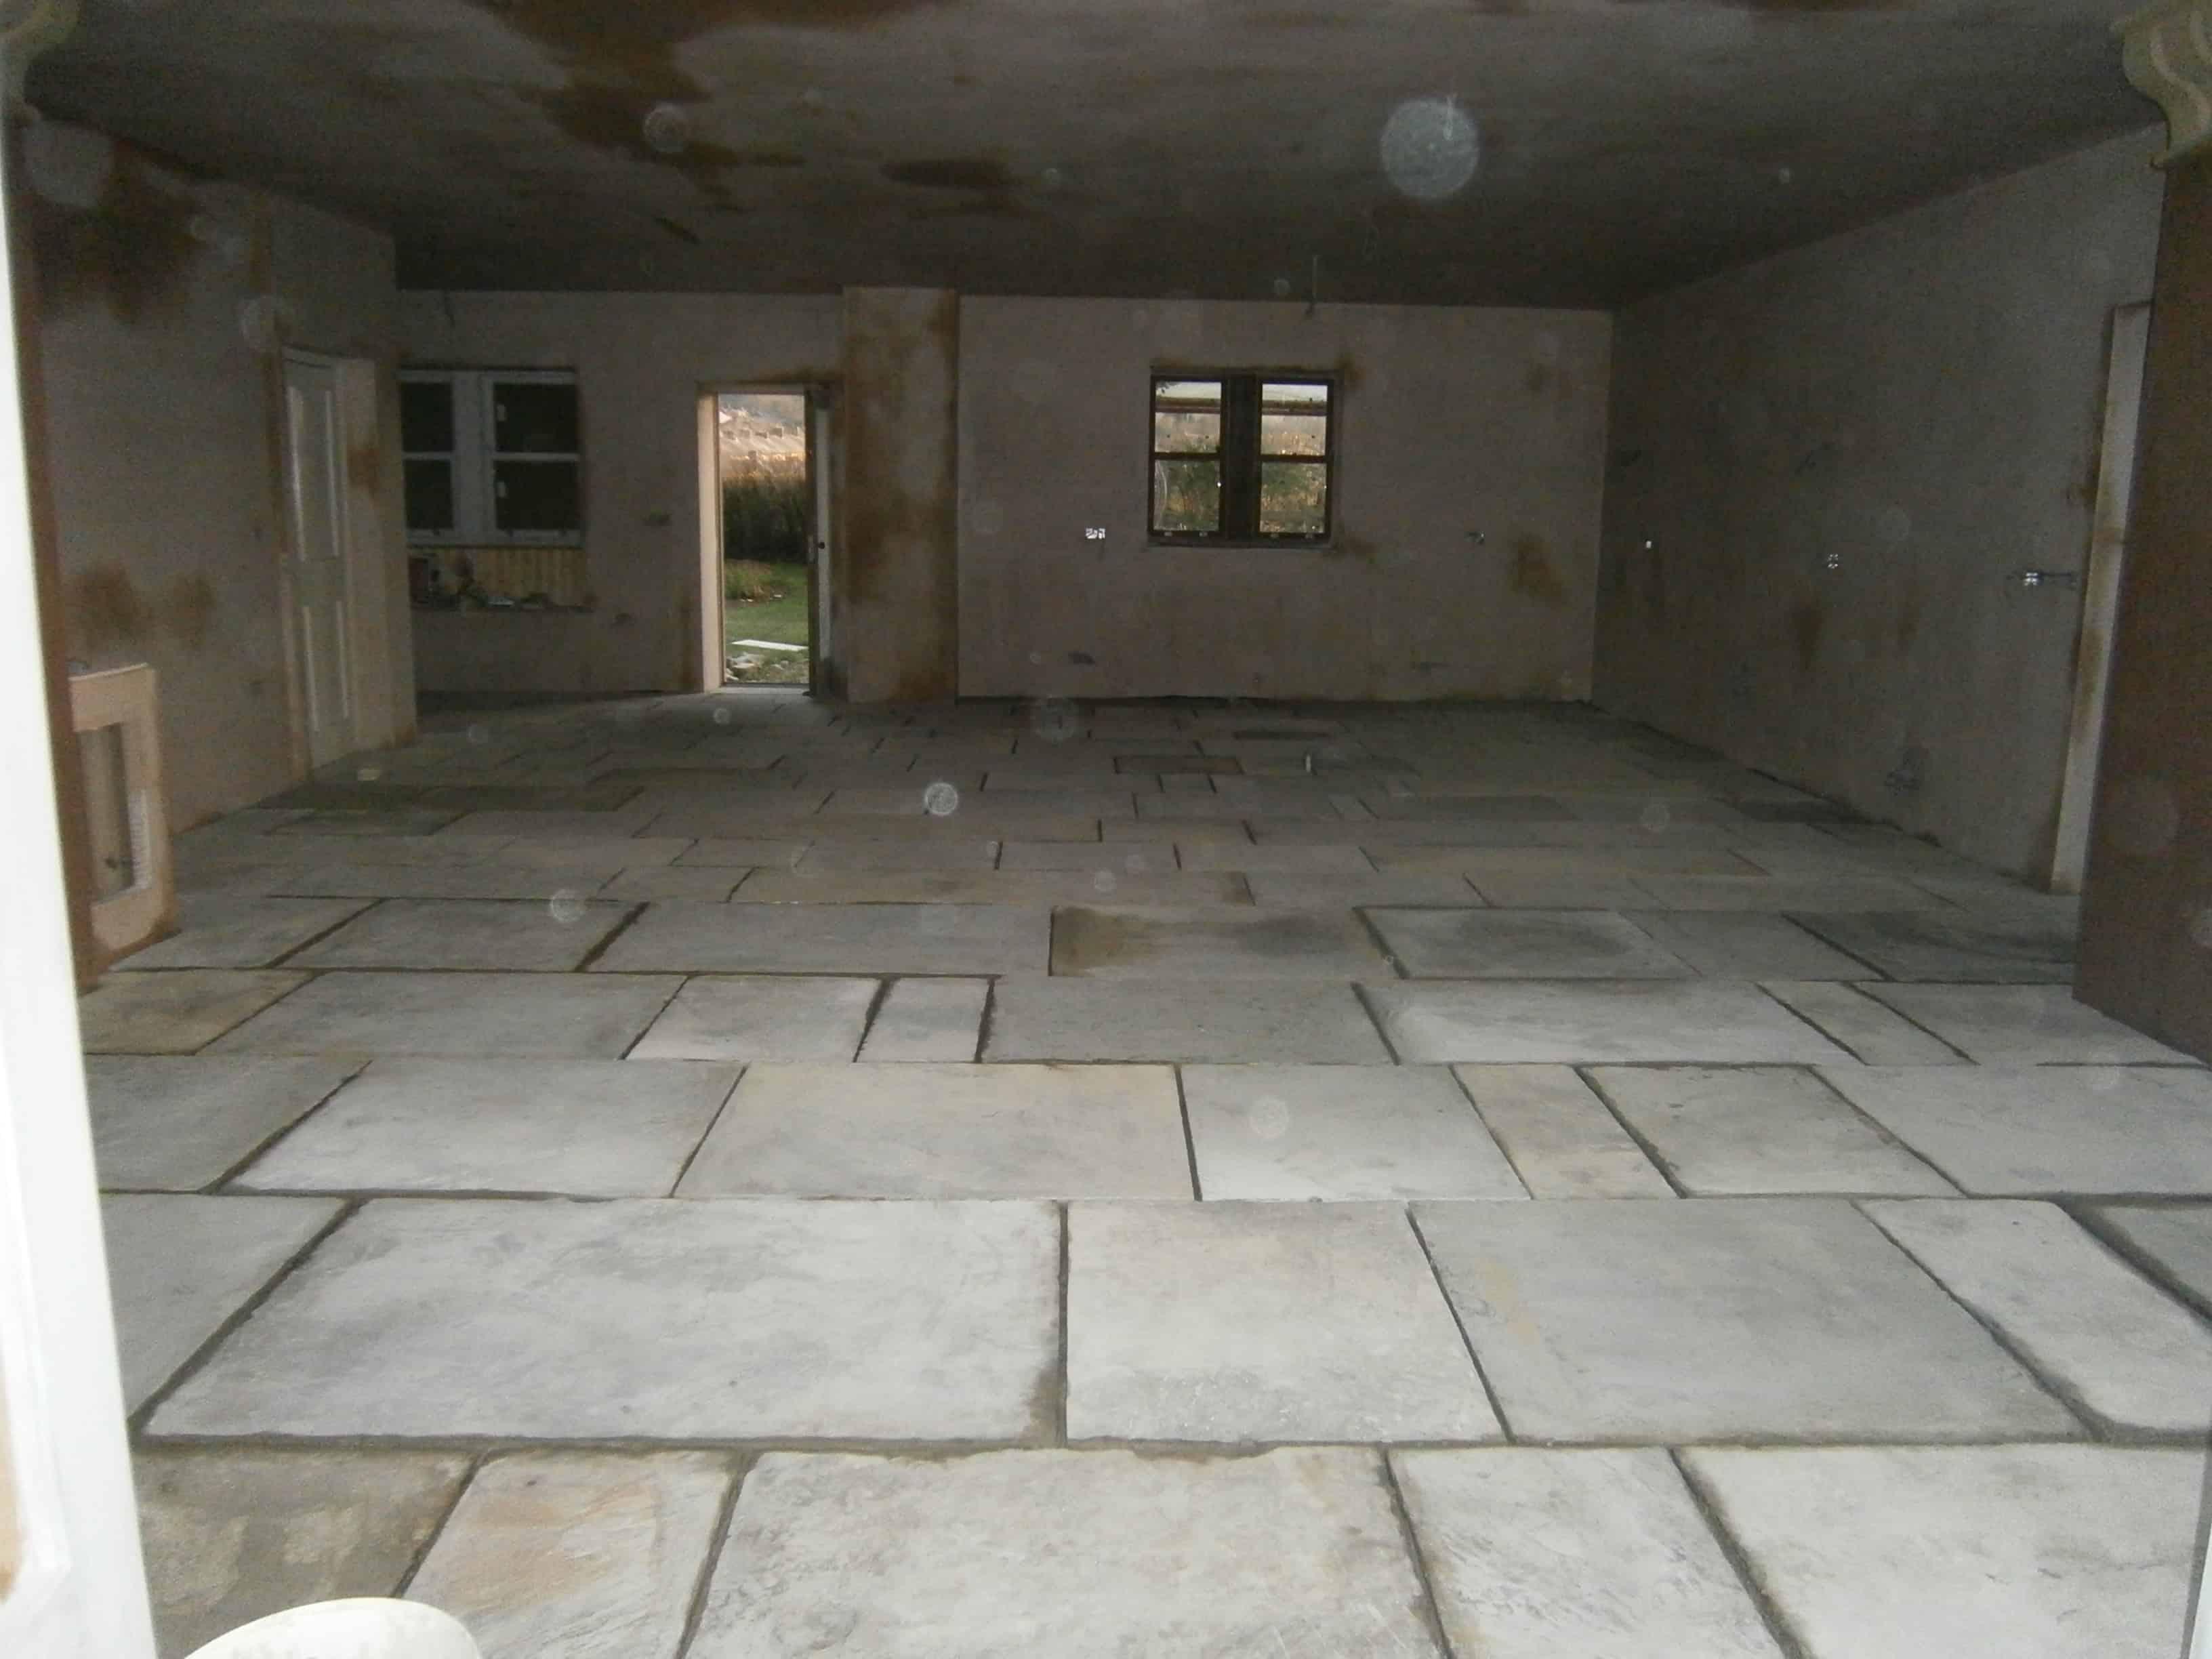 Yorkstone floor the ground beneath her feet york stone flags dailygadgetfo Gallery